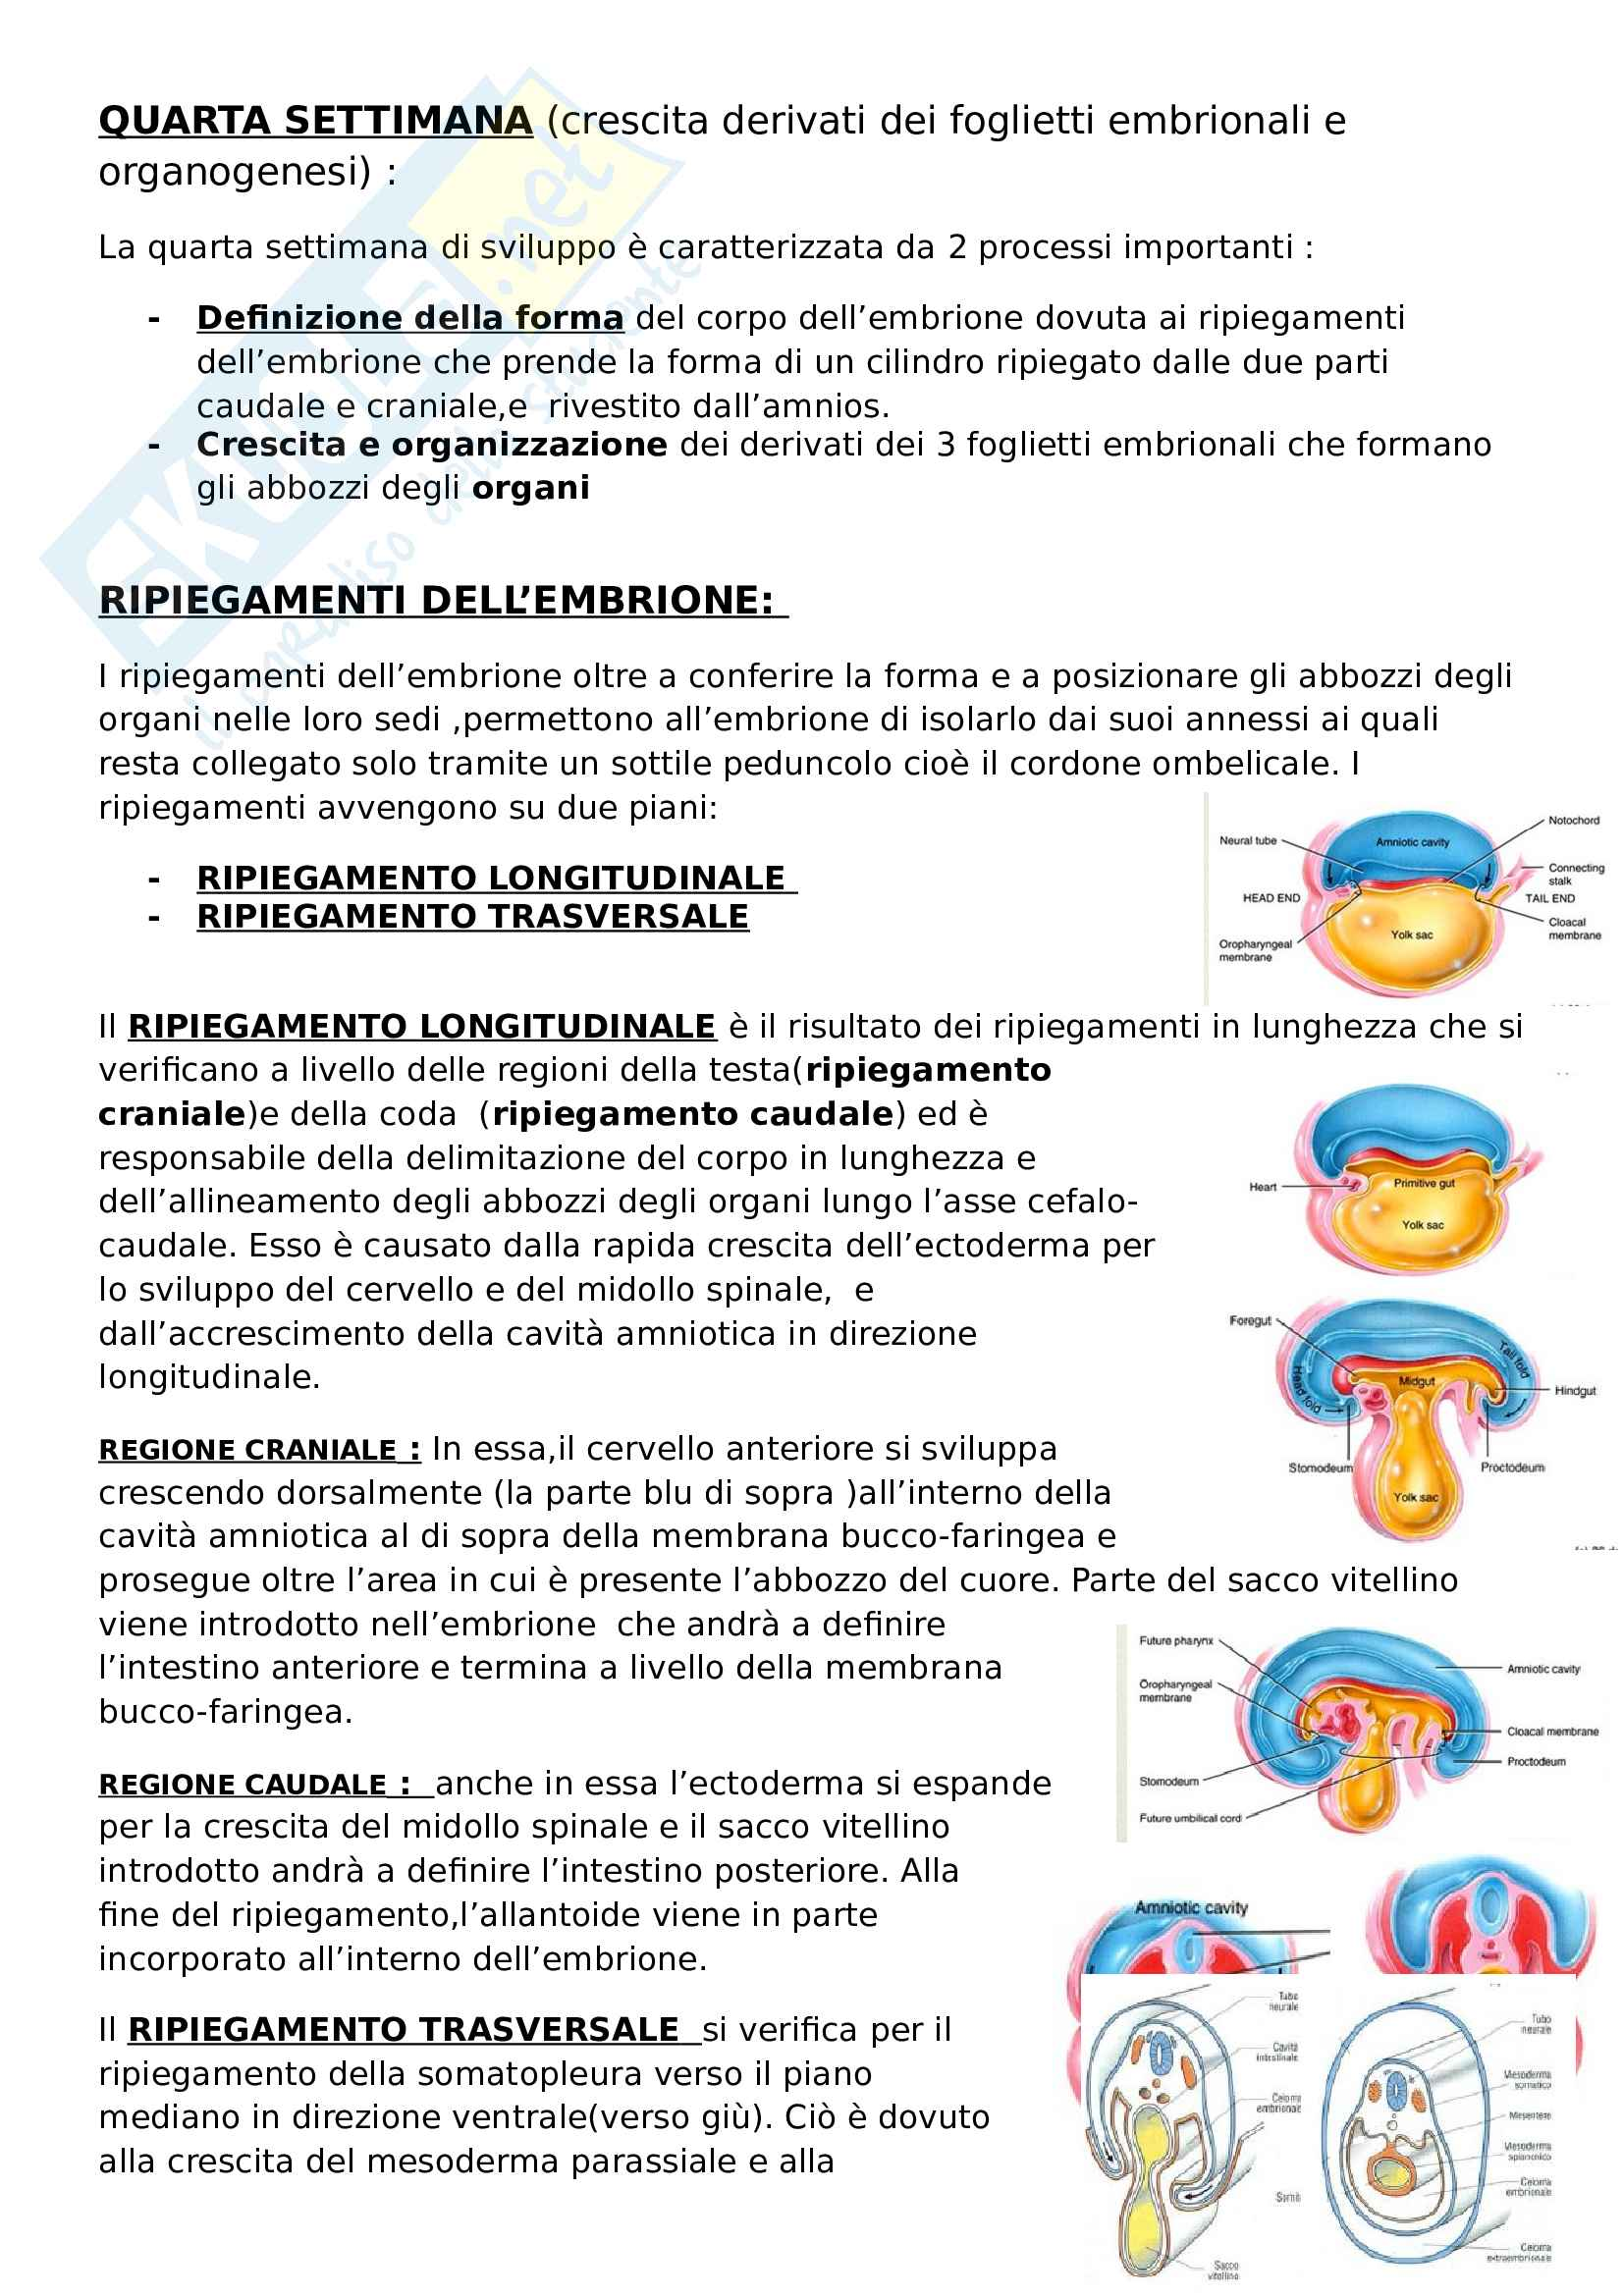 Quarta settimana embriogenesi -Riassunto esame Embriologia, prof. Canipari, libro consigliato De felici